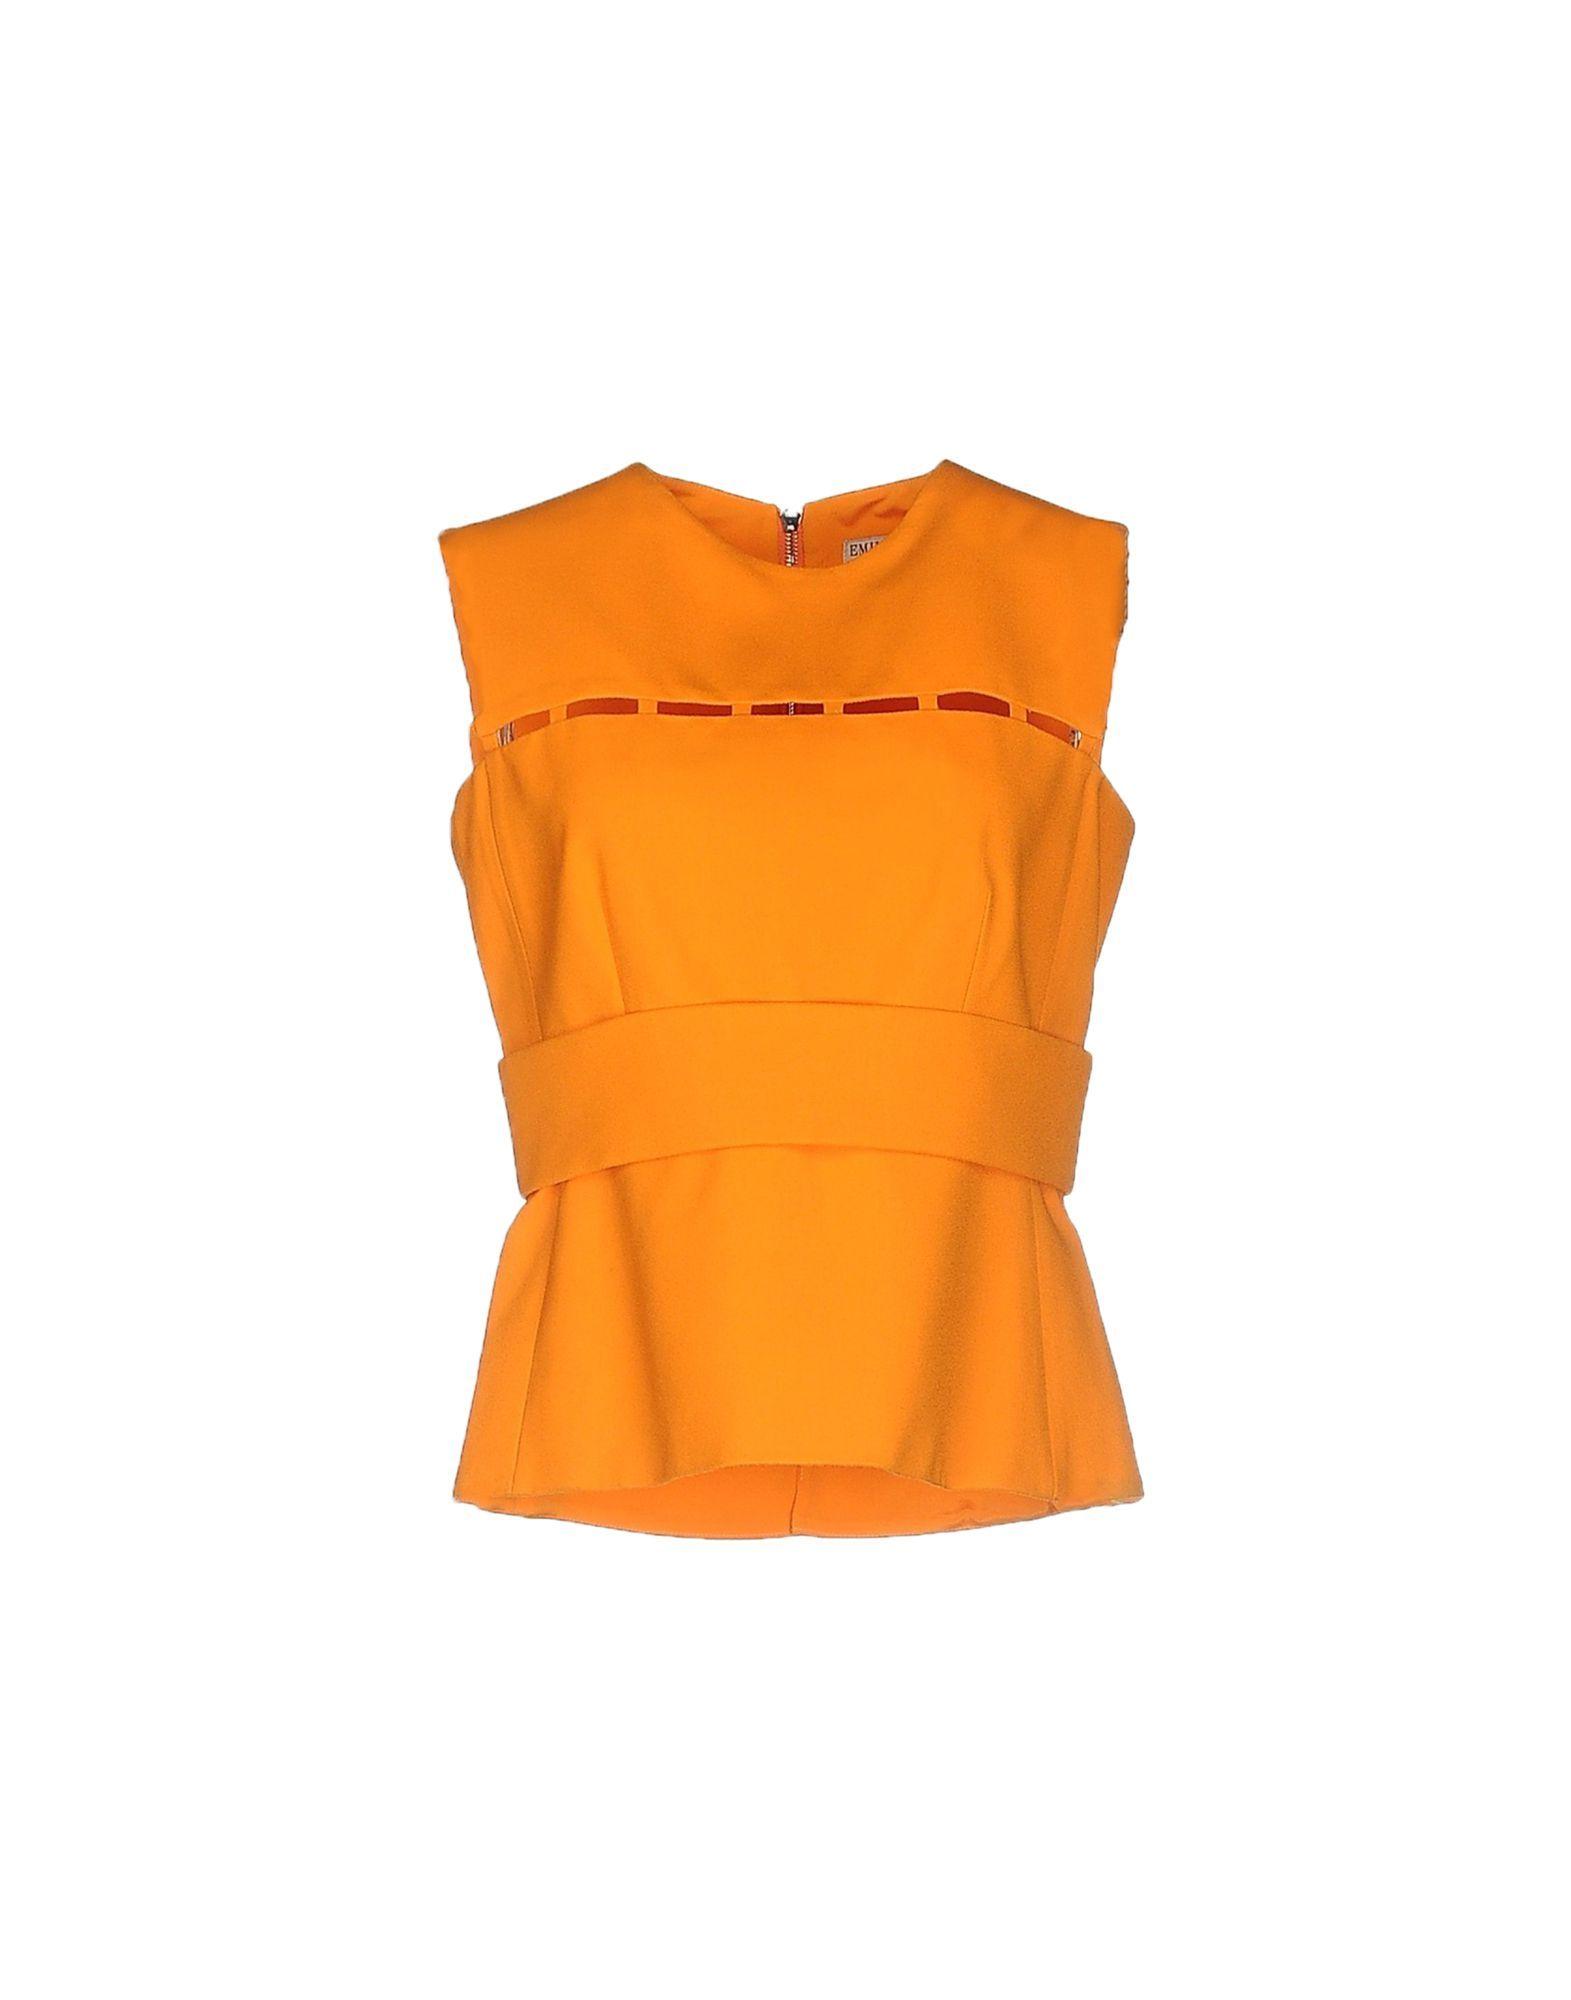 Emilio Pucci Top - Women Emilio Pucci Tops online on YOOX United States - 37824448AQ